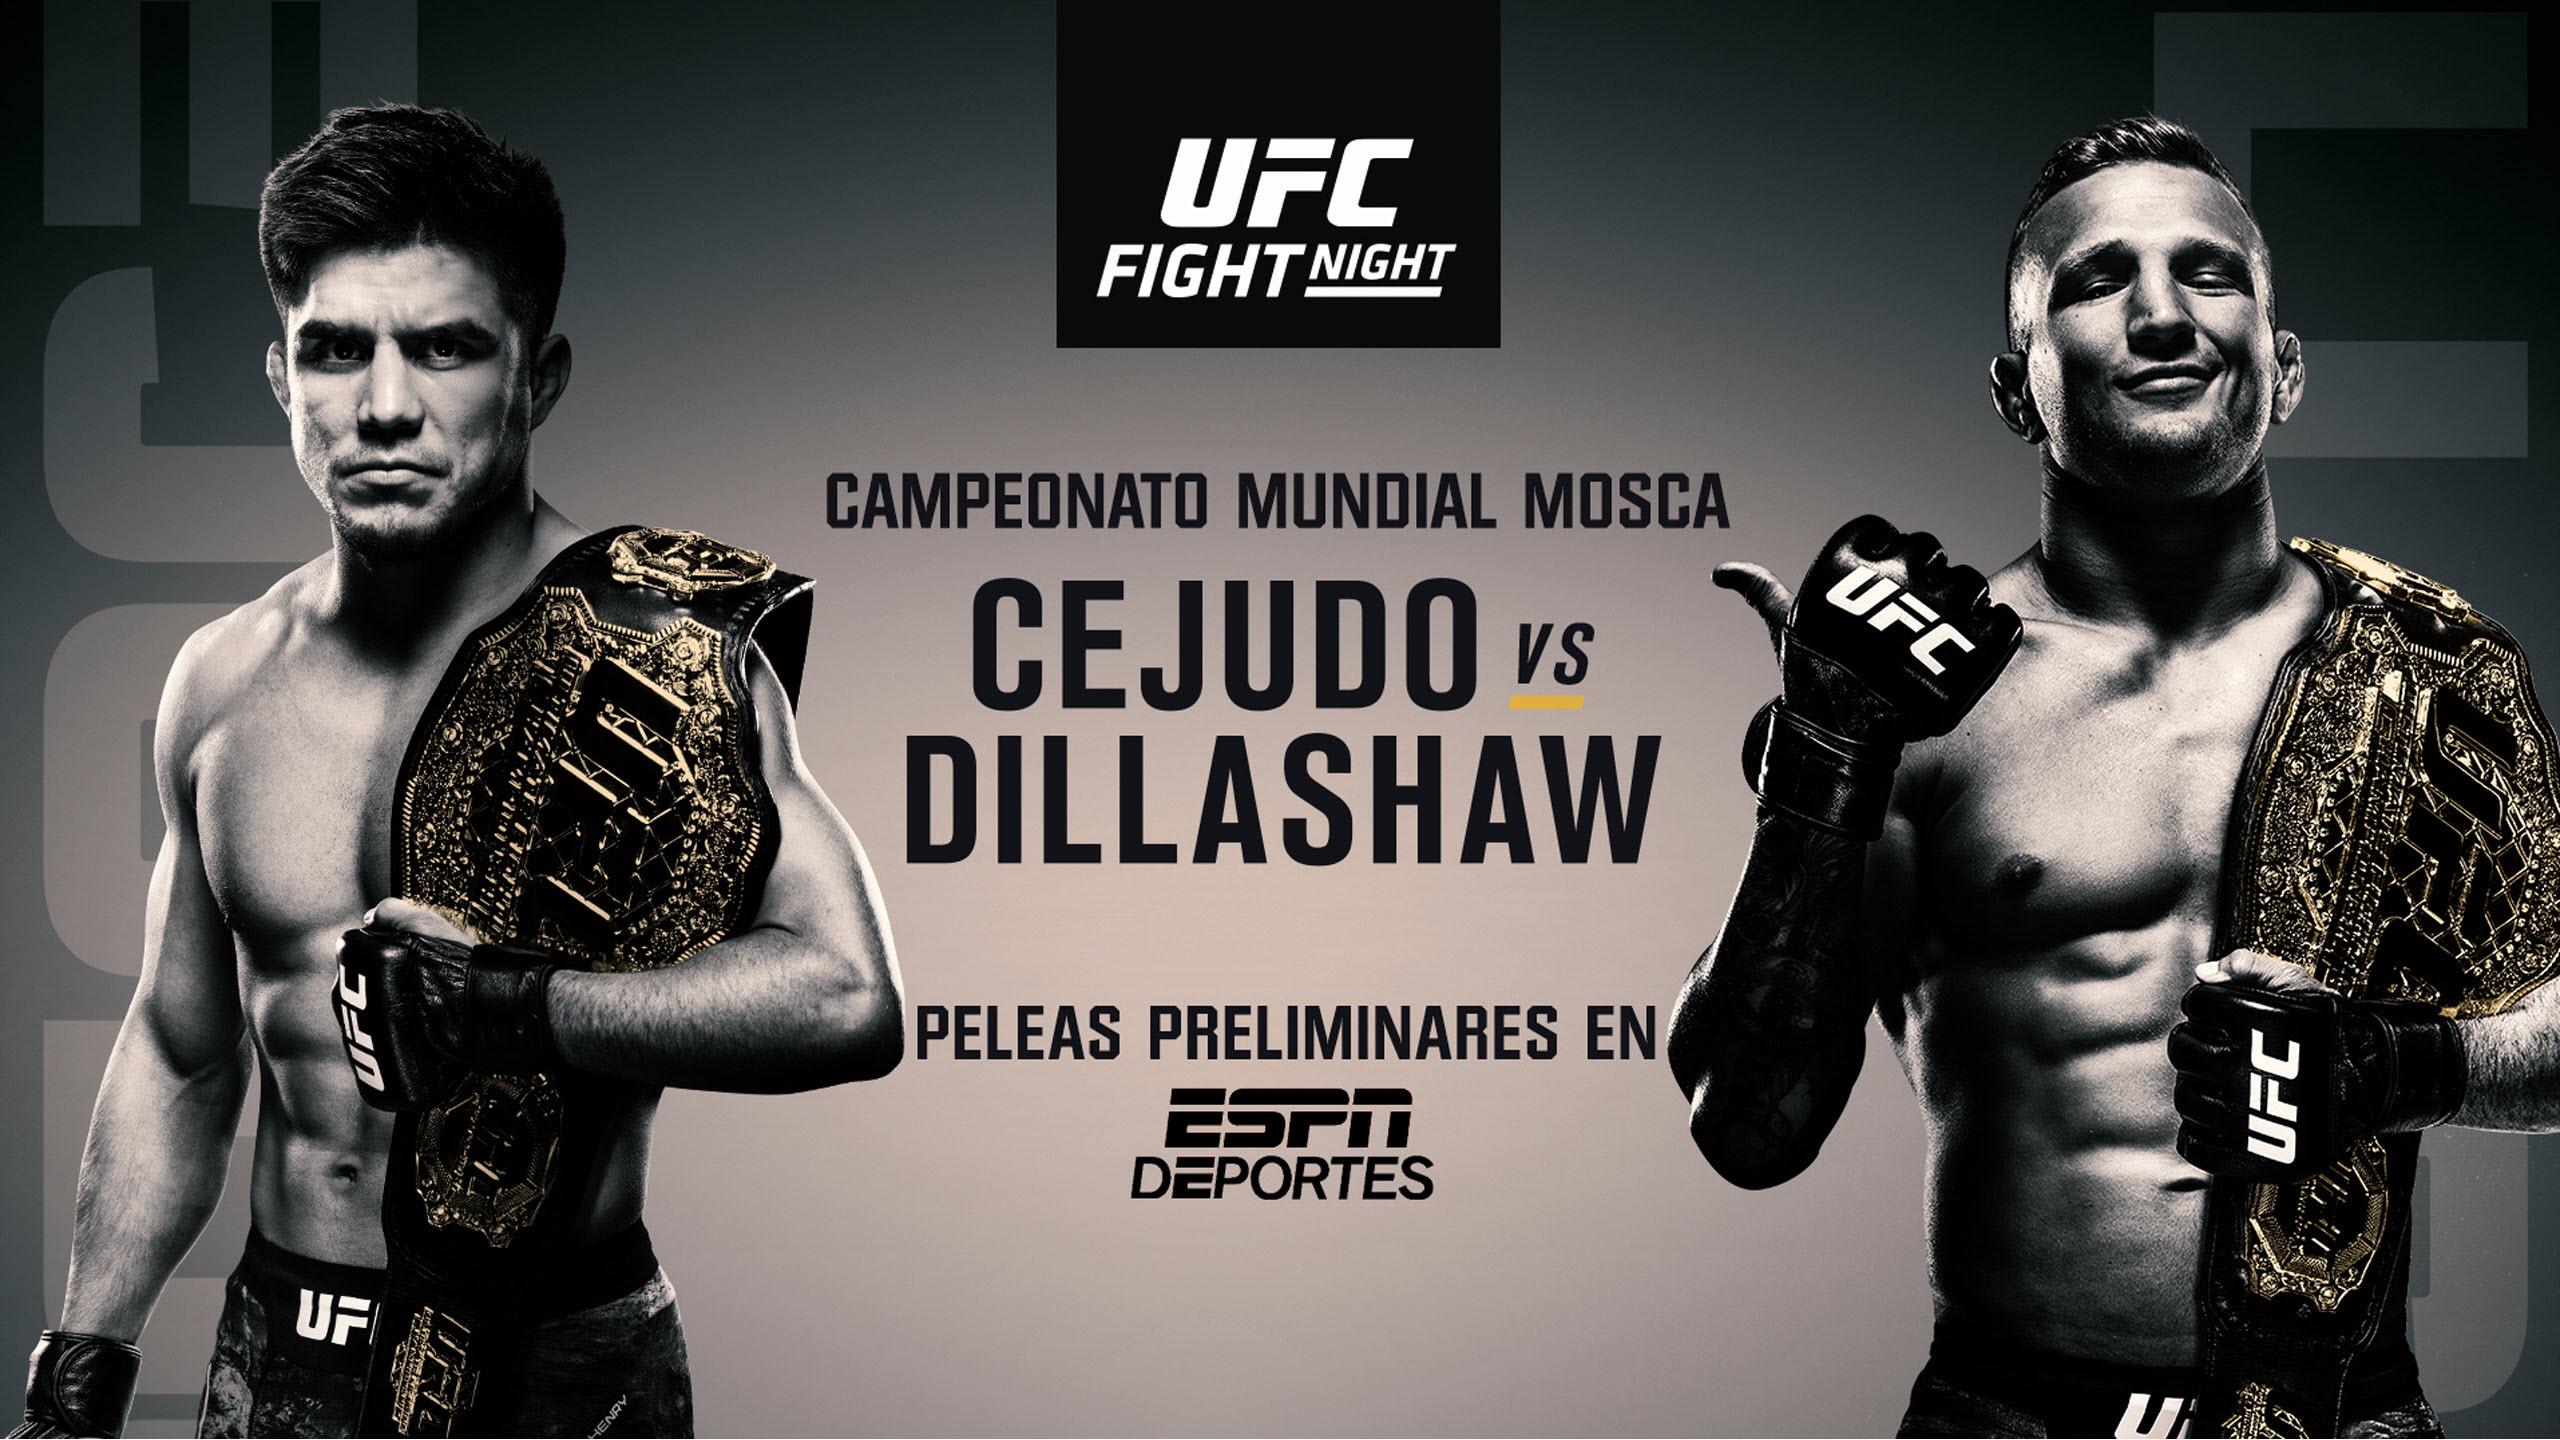 UFC Fight Night (Prelims)